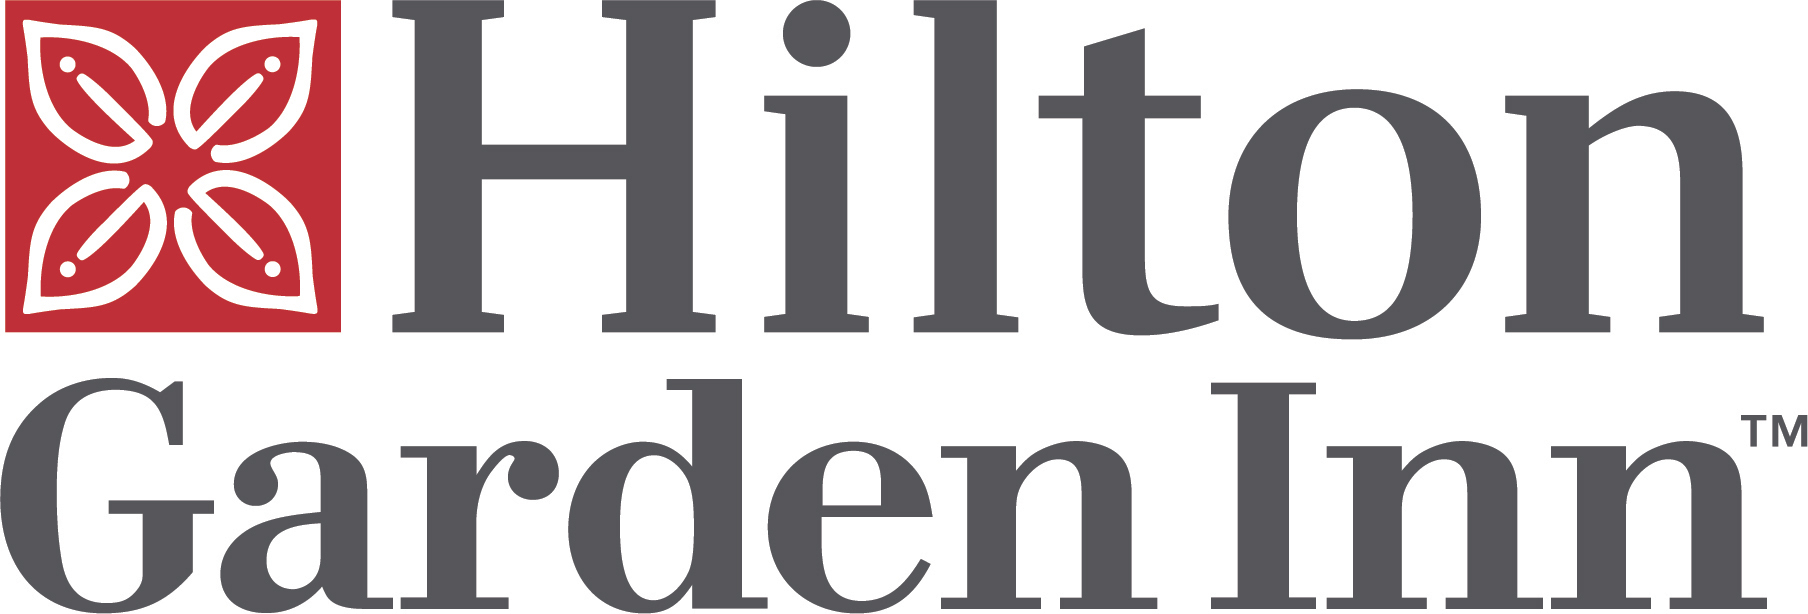 Hilton Garden Inn Continues 2018 Expansion Announces Several New